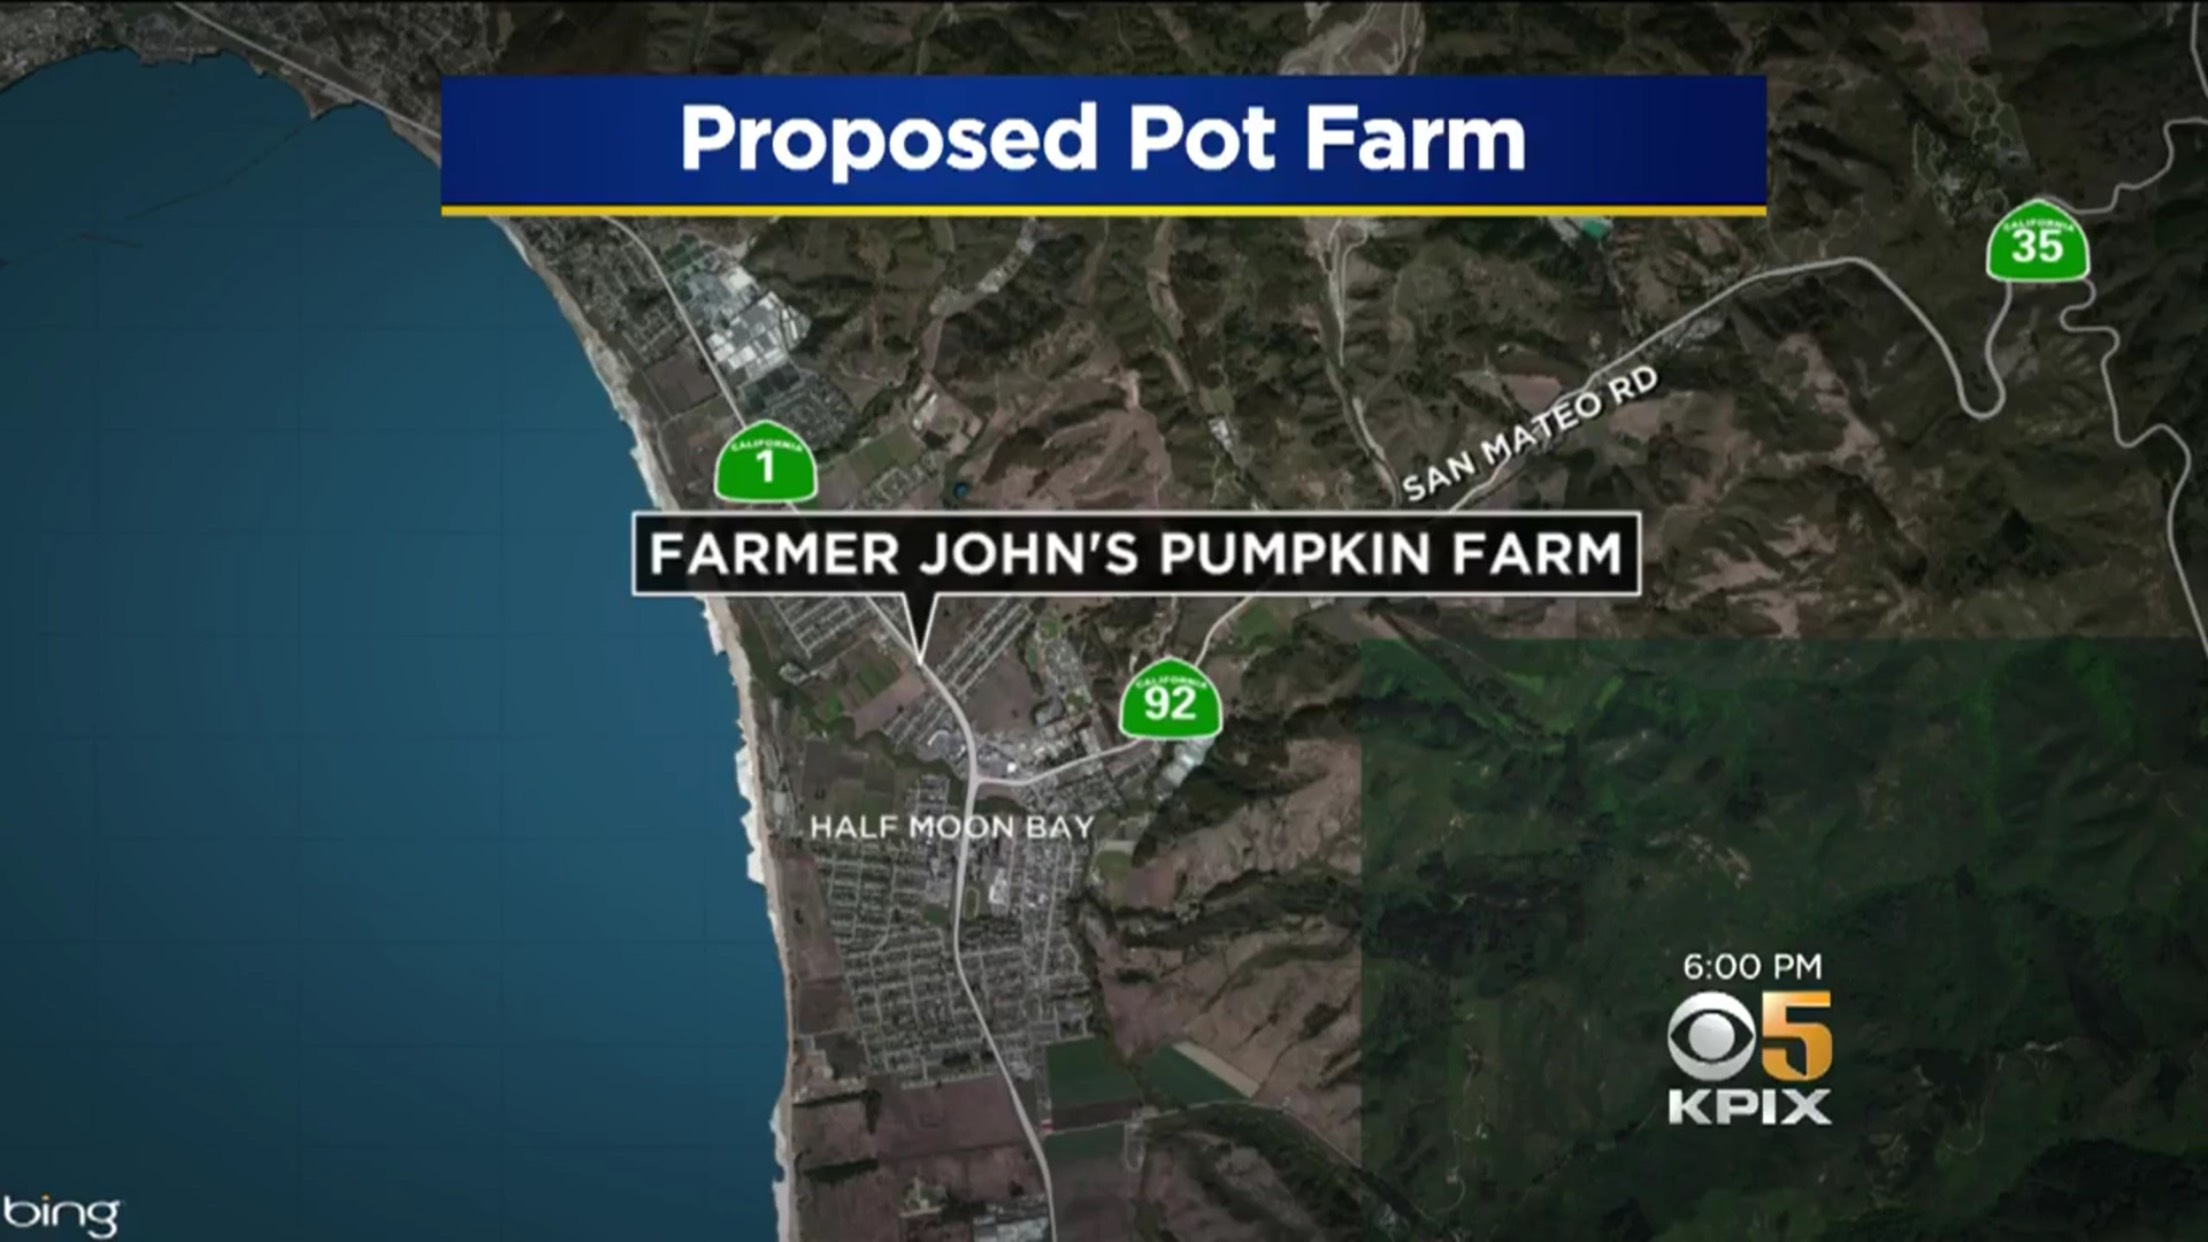 Proposed Pot Farm: Farmer John's Pumpkin Farm